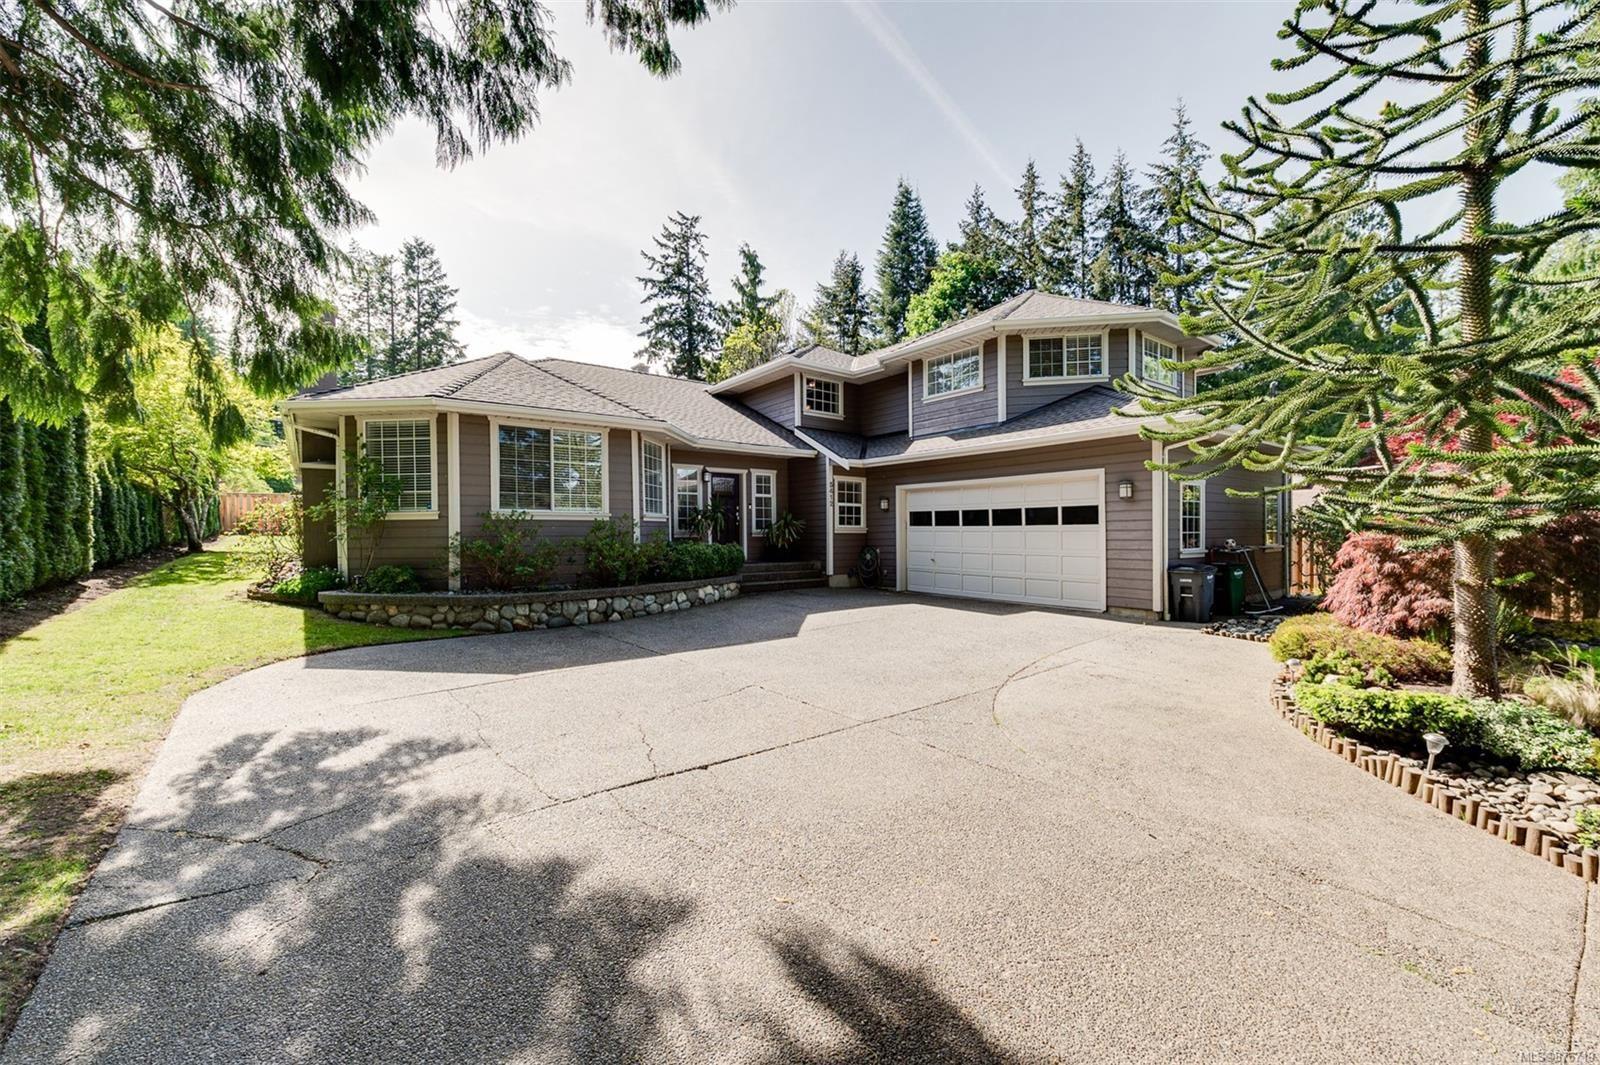 Main Photo: 5412 Lochside Dr in : SE Cordova Bay House for sale (Saanich East)  : MLS®# 876719